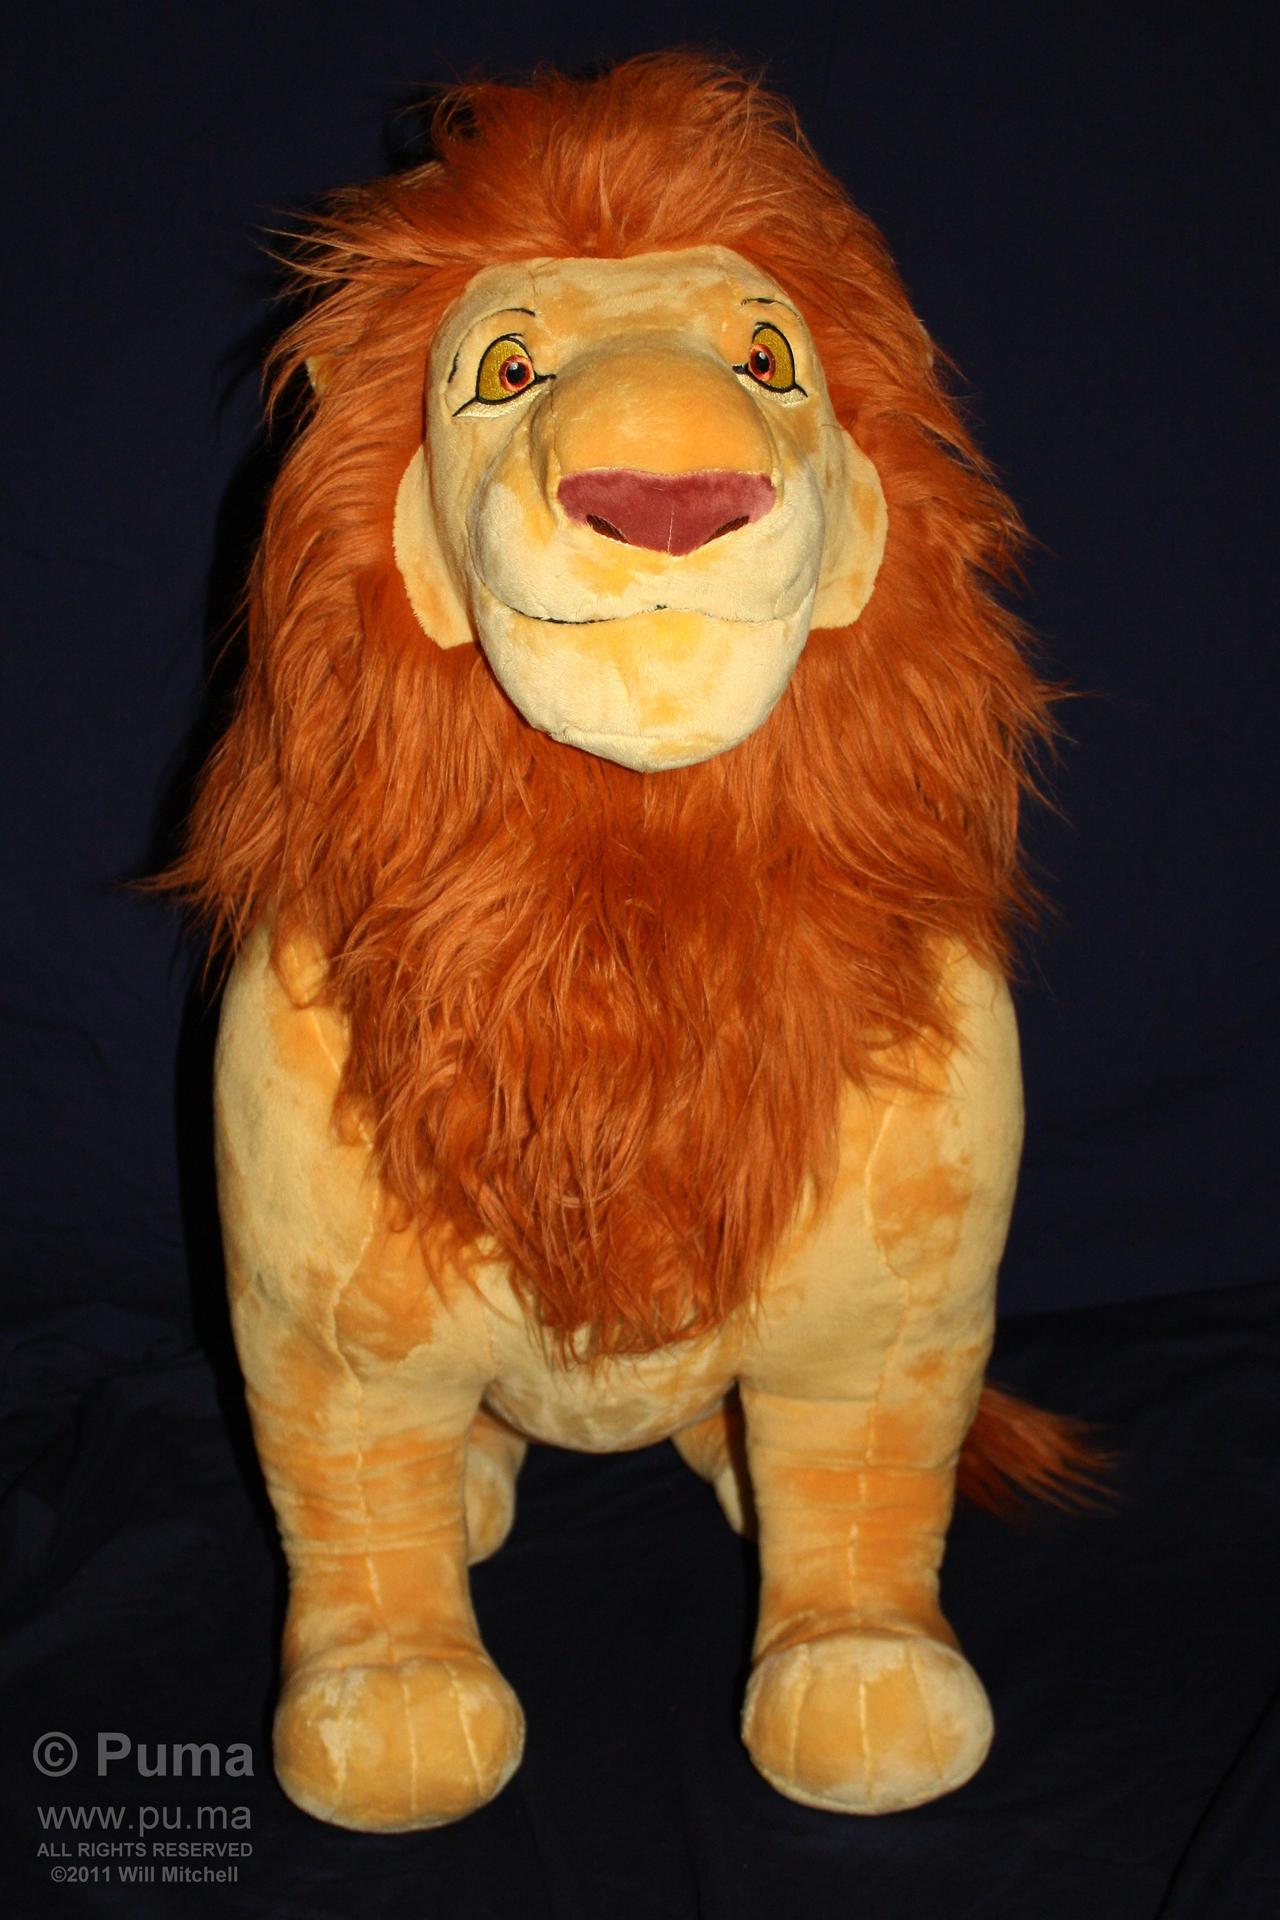 Lion King - Mufasa plush 2011 by dapumakat